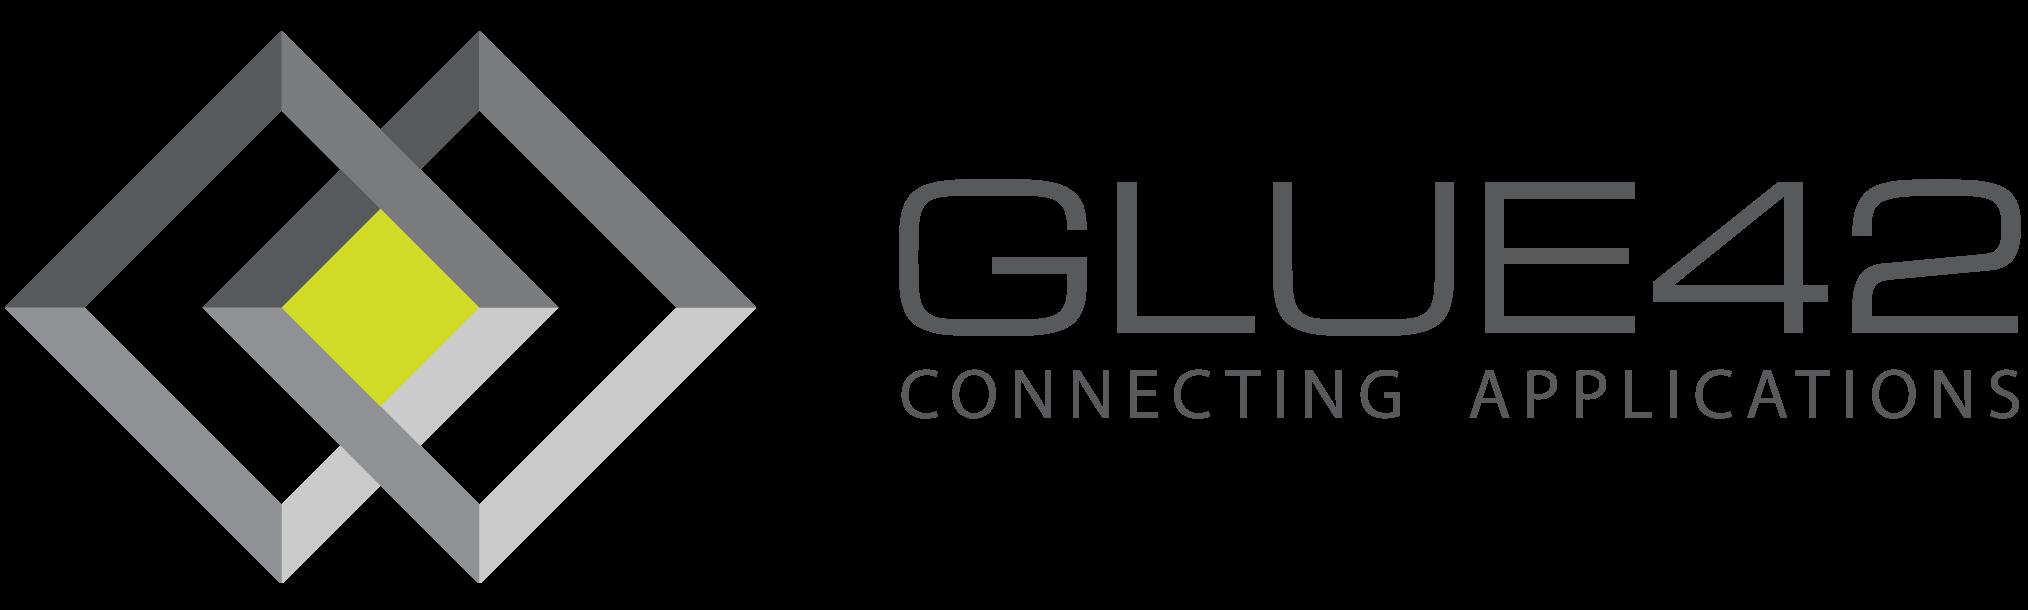 GLUE42.png